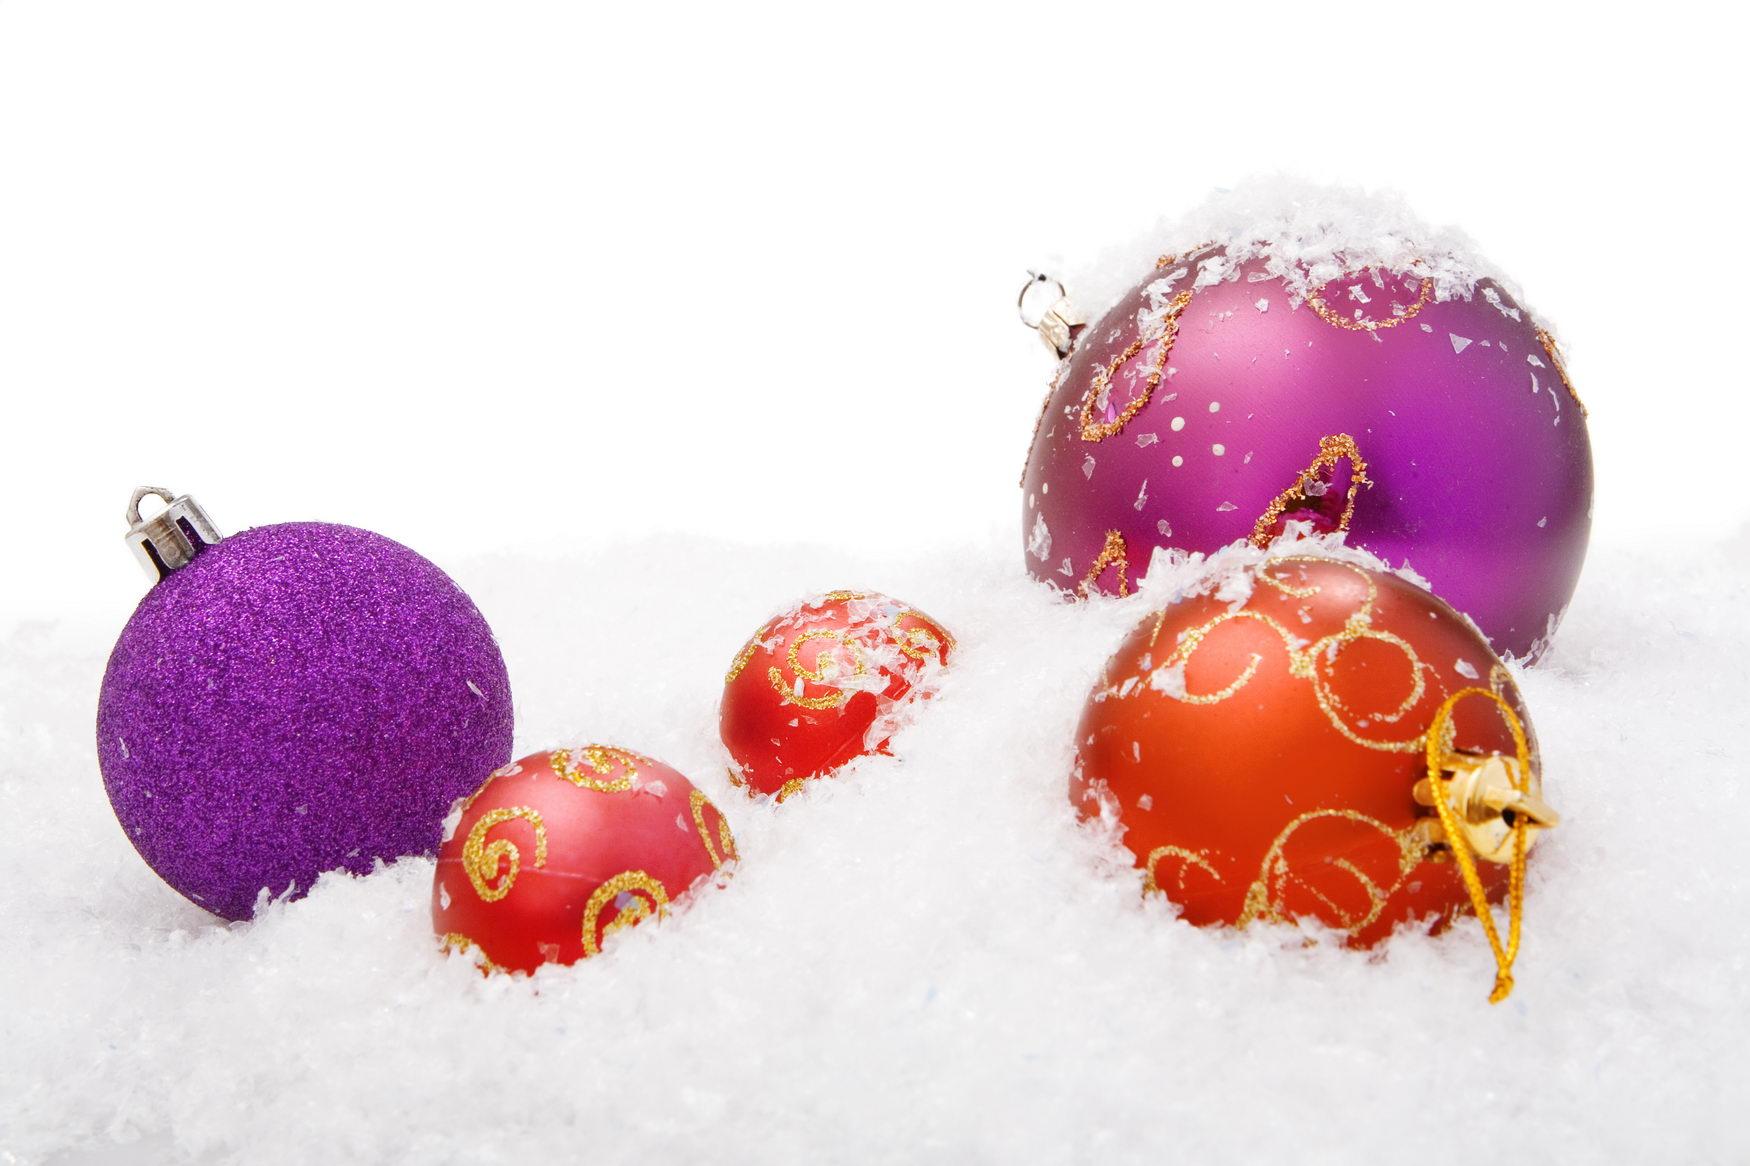 christmas balls, Ball, Shine, Ornament, Red, HQ Photo